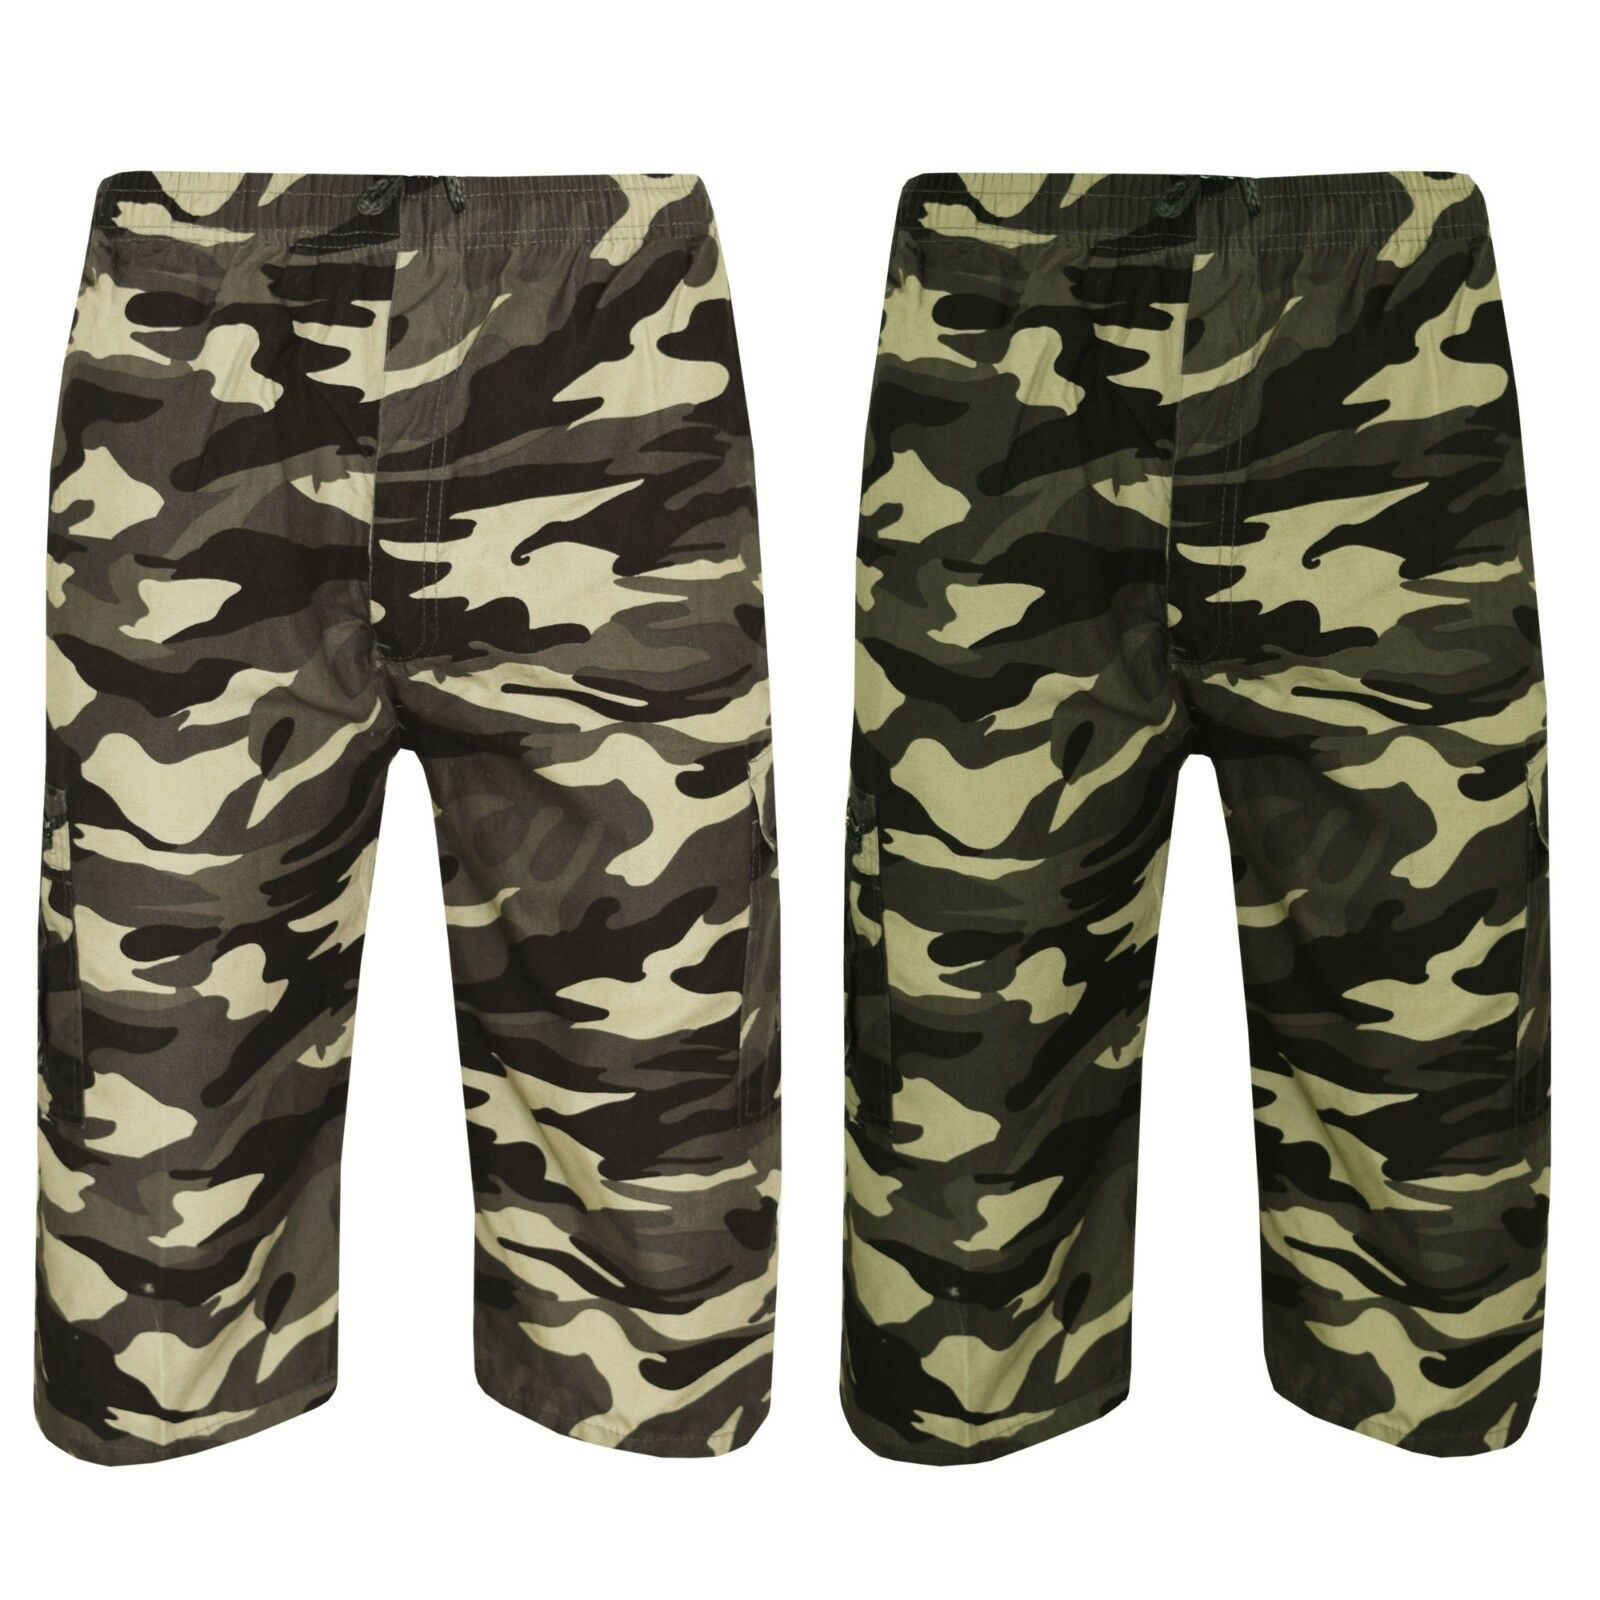 Hombre Ejército 3 4 Cintura Elástica Bermudas Militar Cargo Bolsillos Camuflaje